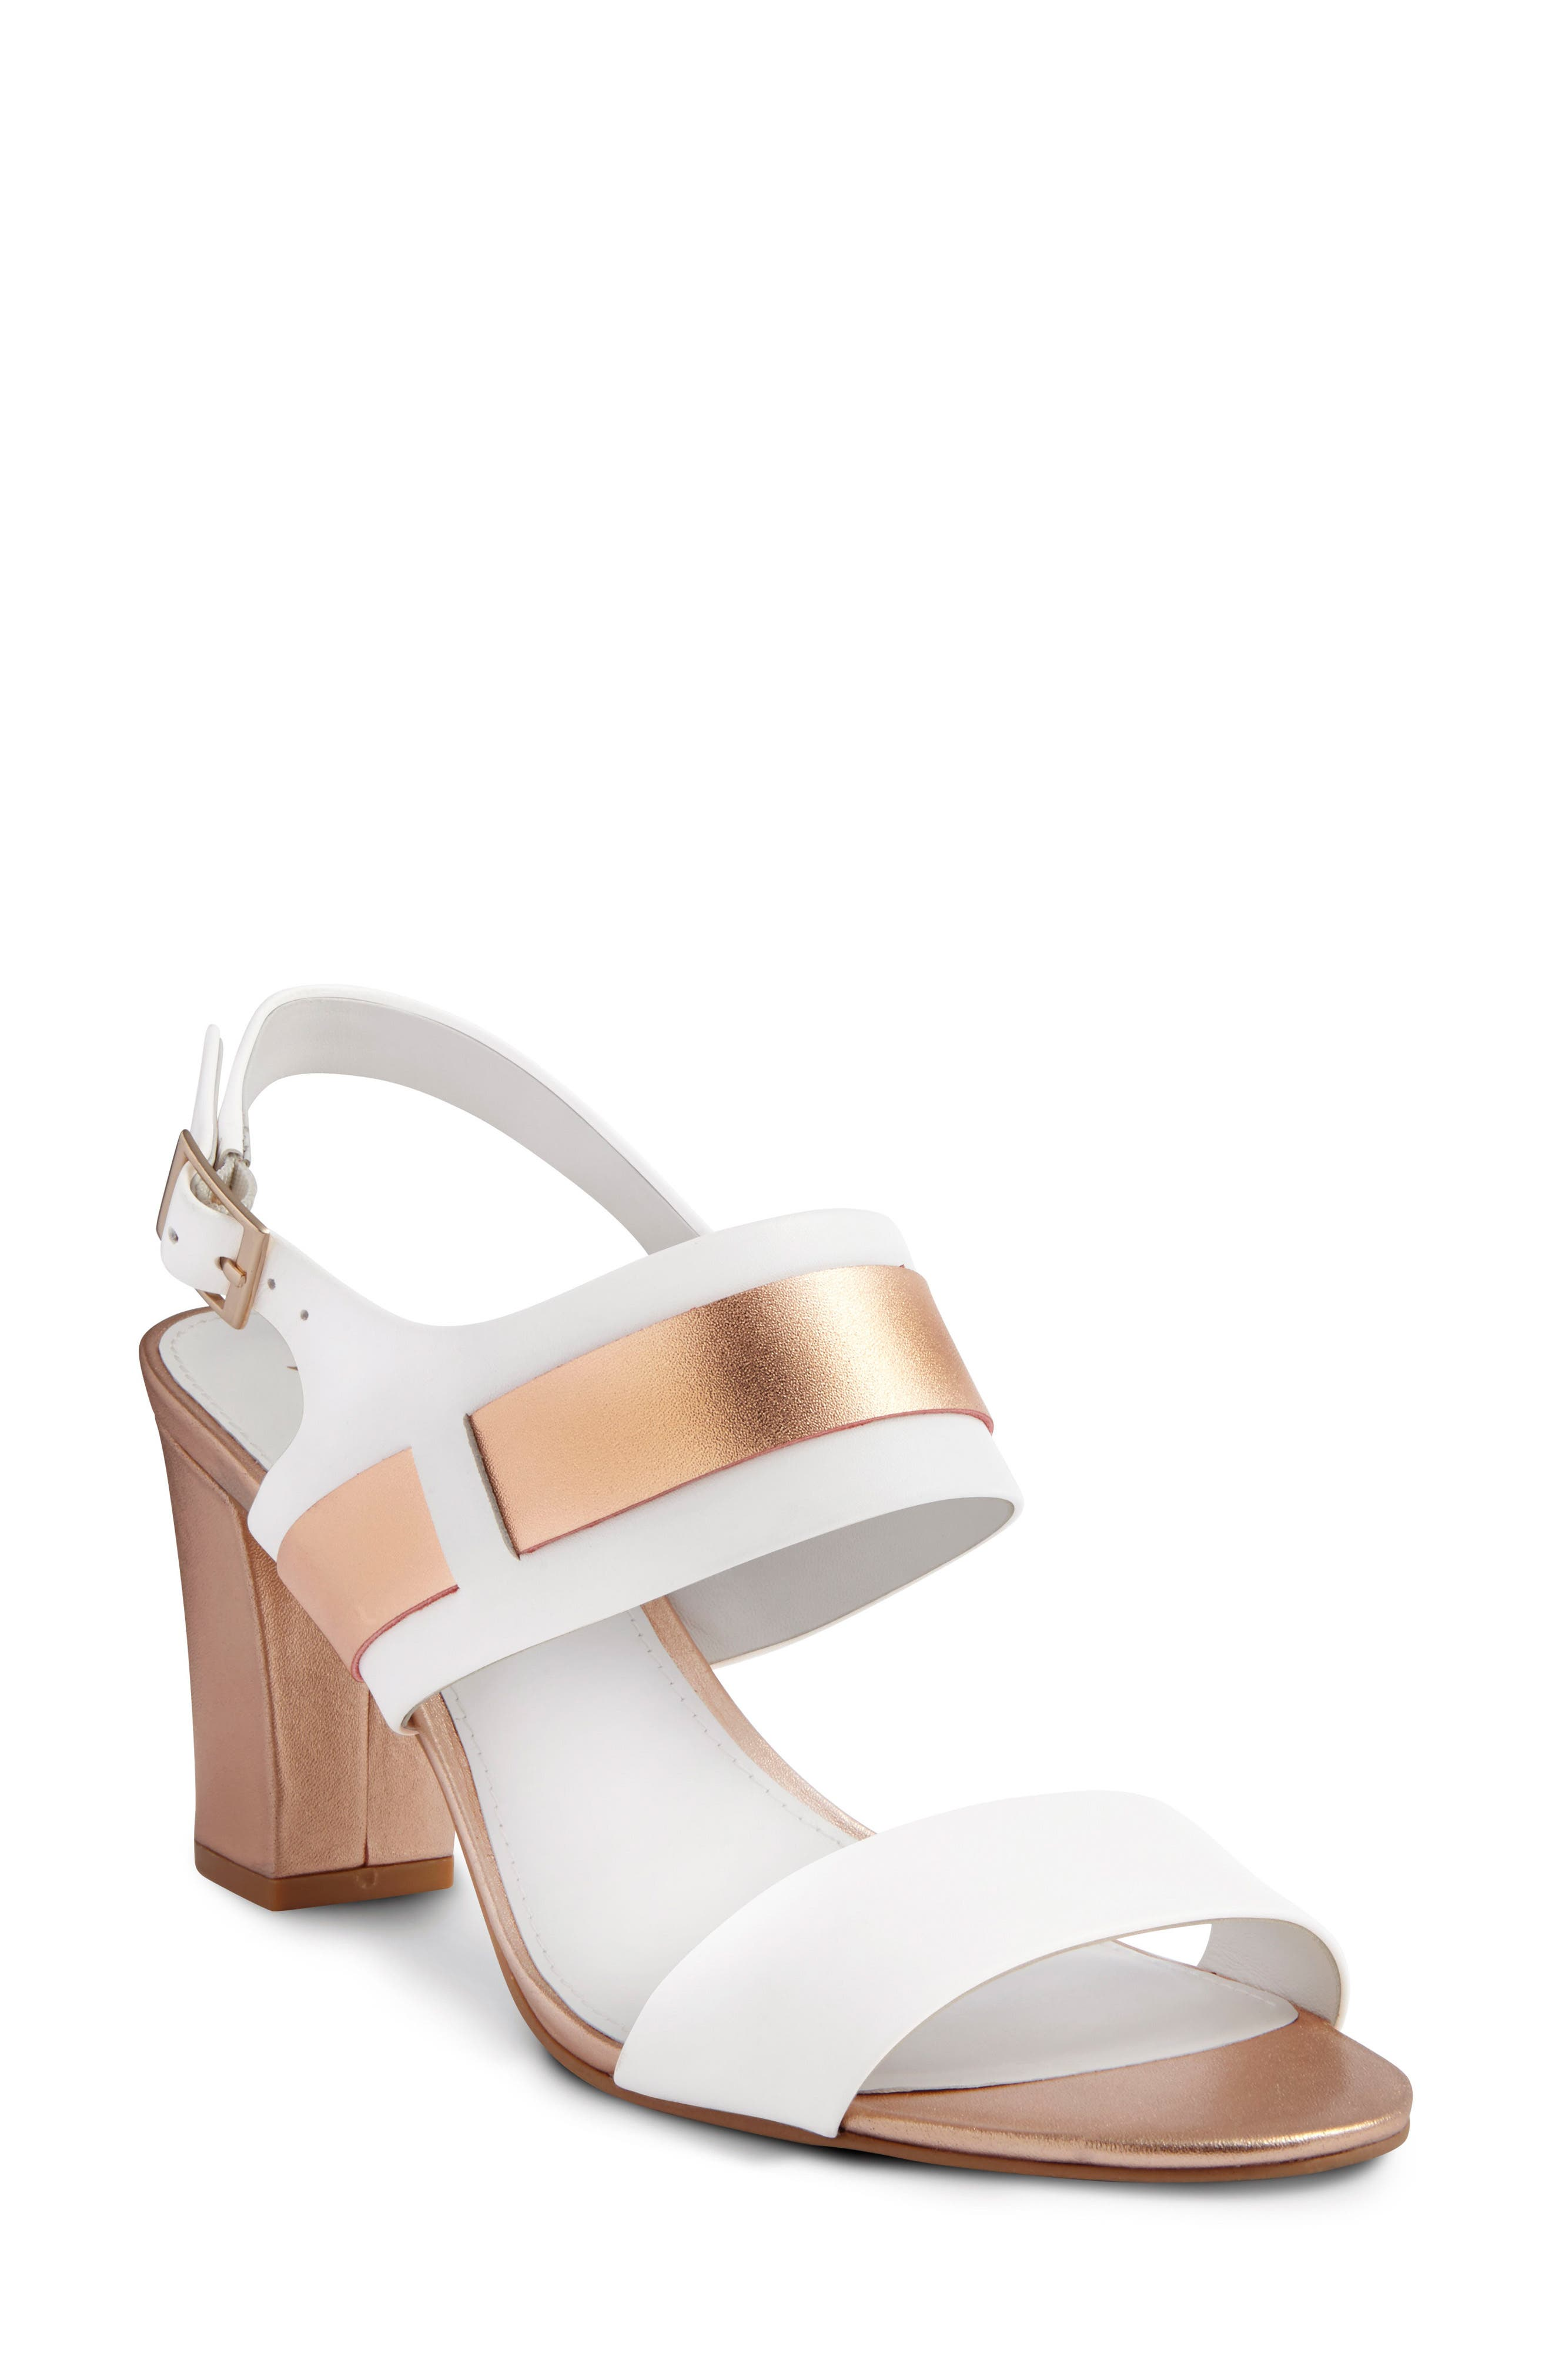 Shoes of Prey Slingback Sandal (Women)